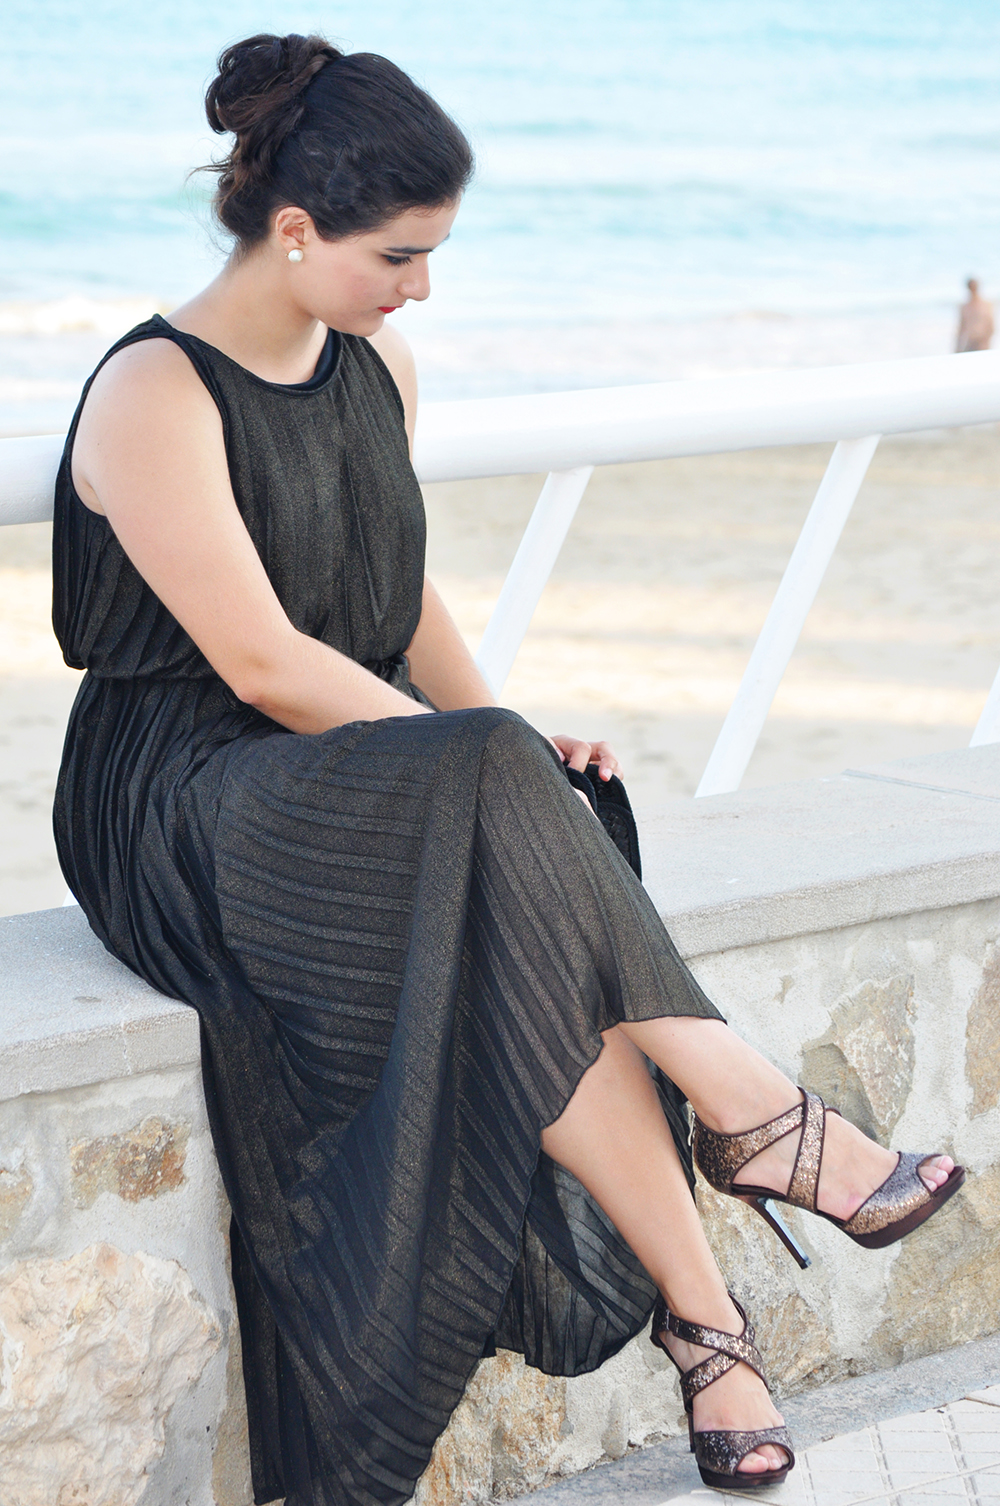 vintage fortuny delphos dress couture valencia fashion blogger, pleated dress long maxi summer somethingfashion vestido, el tiempo entre costuras time in between TV series ancient greece